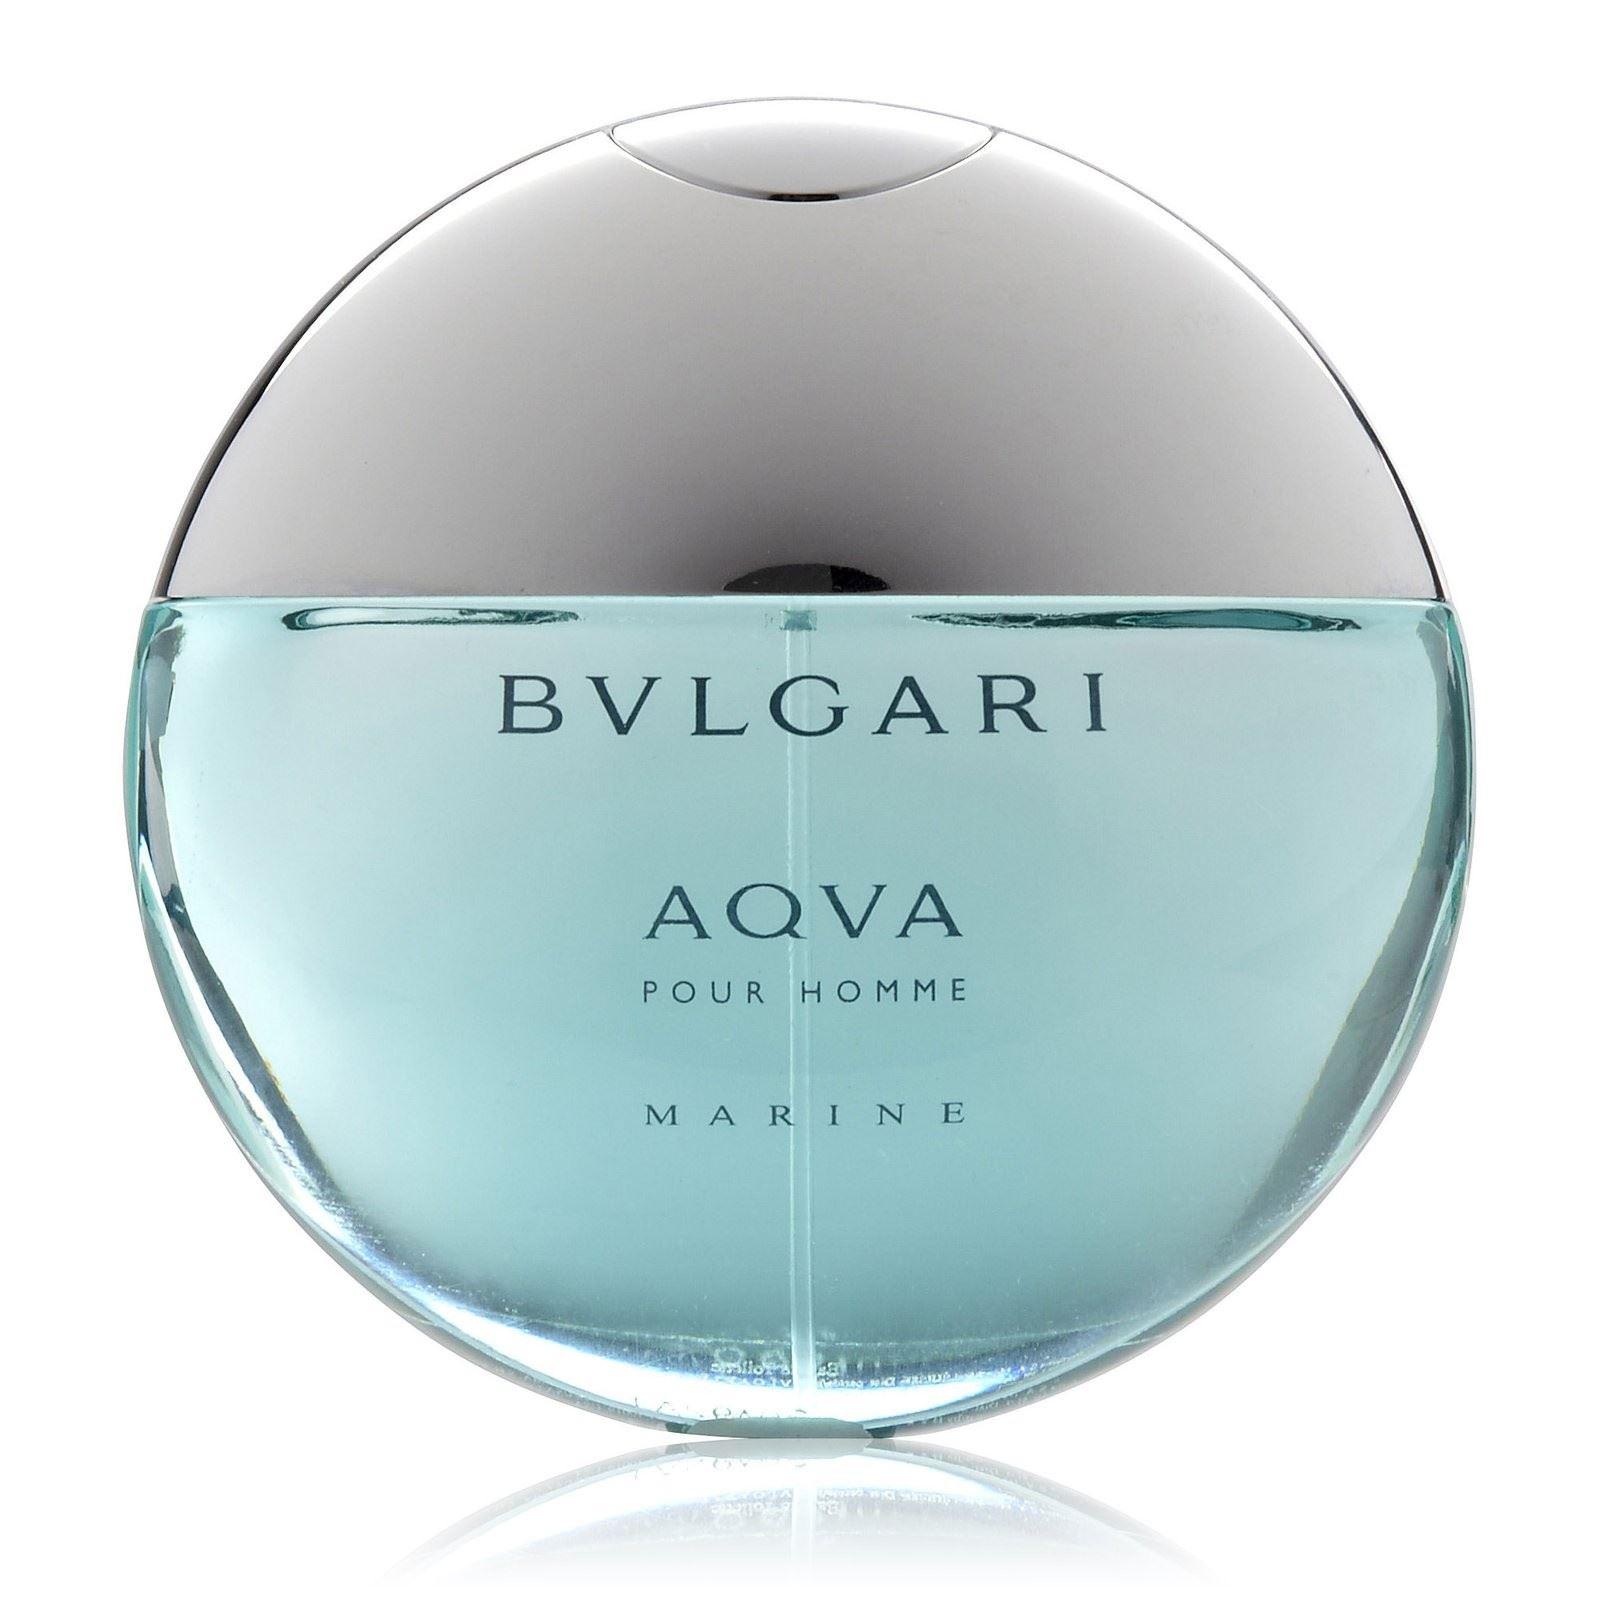 Bvlgari Aqva Pour Homme Marine EDT 100 ml Erkek Parfüm